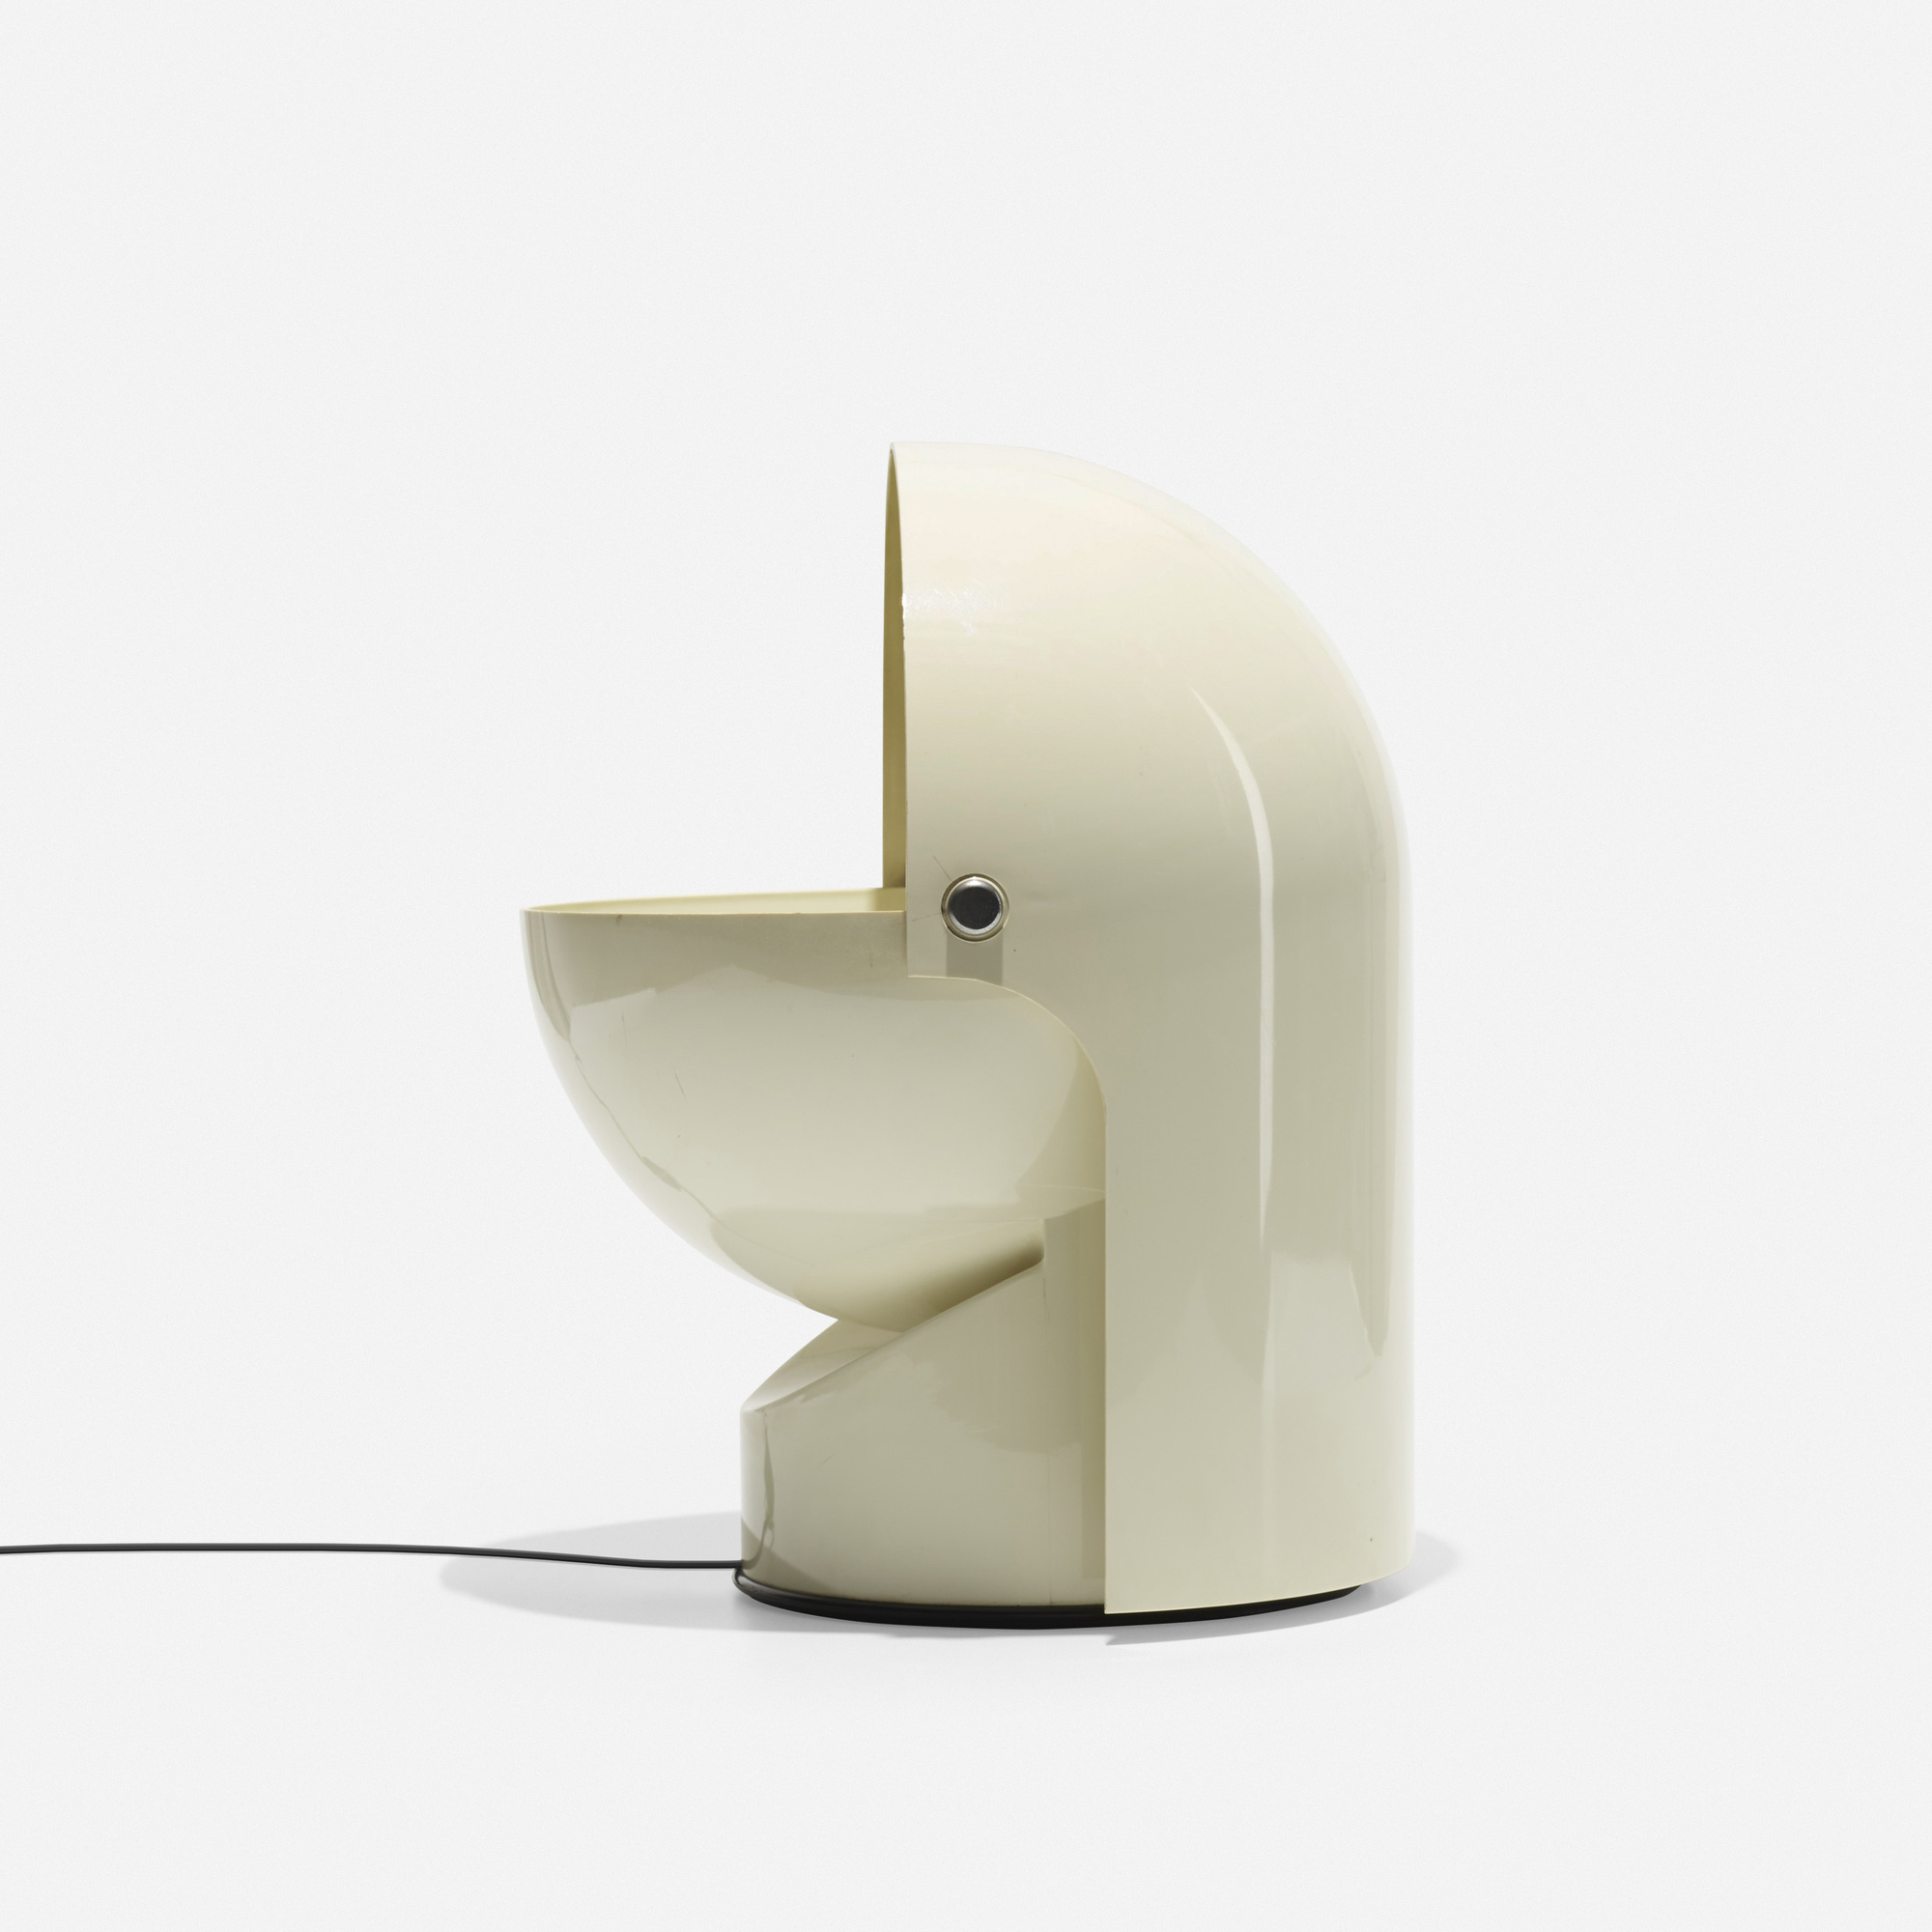 204: Gae Aulenti / Mezzopileo table lamp (2 of 3)